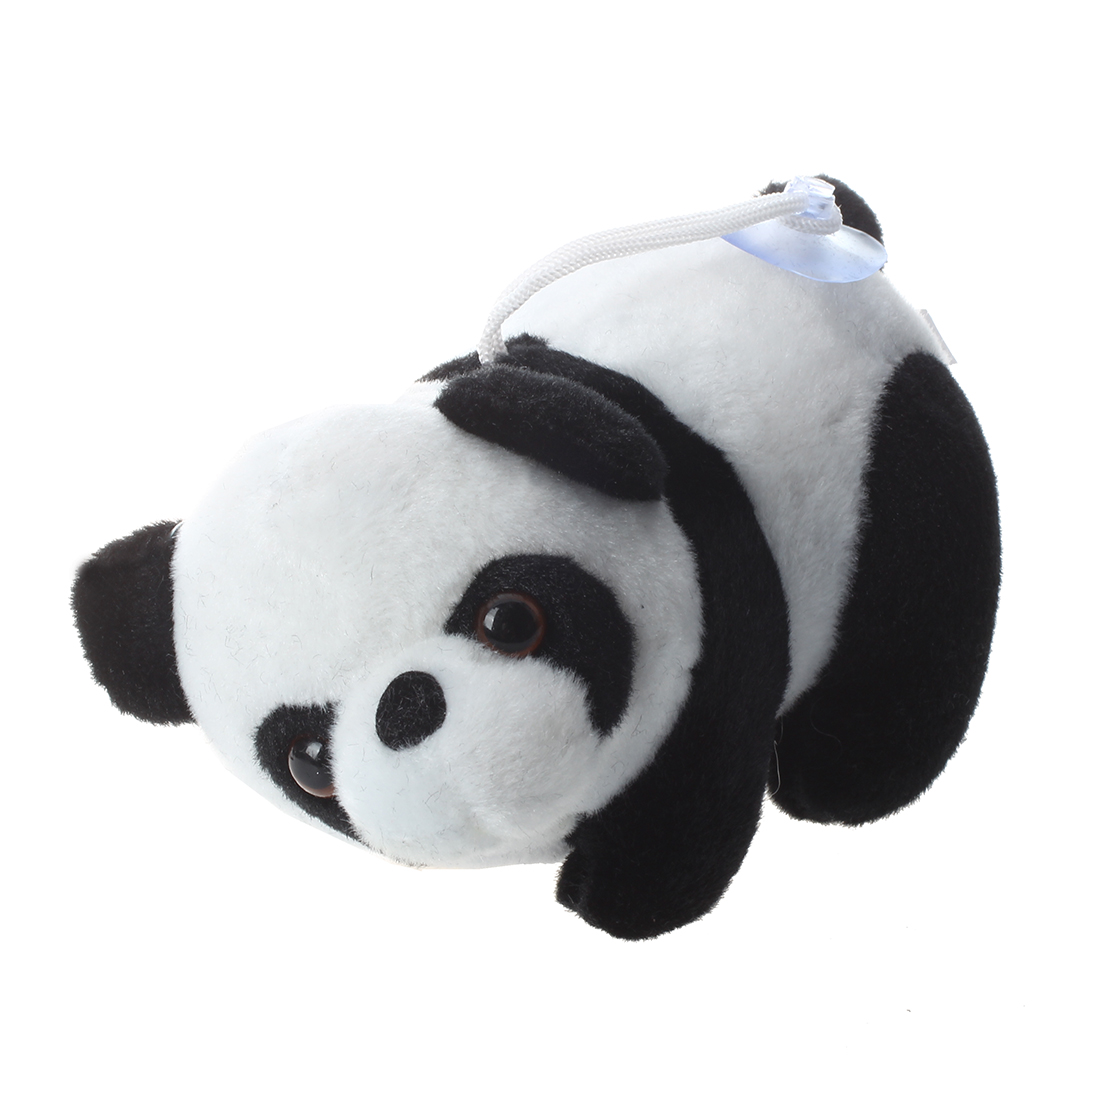 Plush doll doudou panda font b toy b font Figure 16 cm for baby child